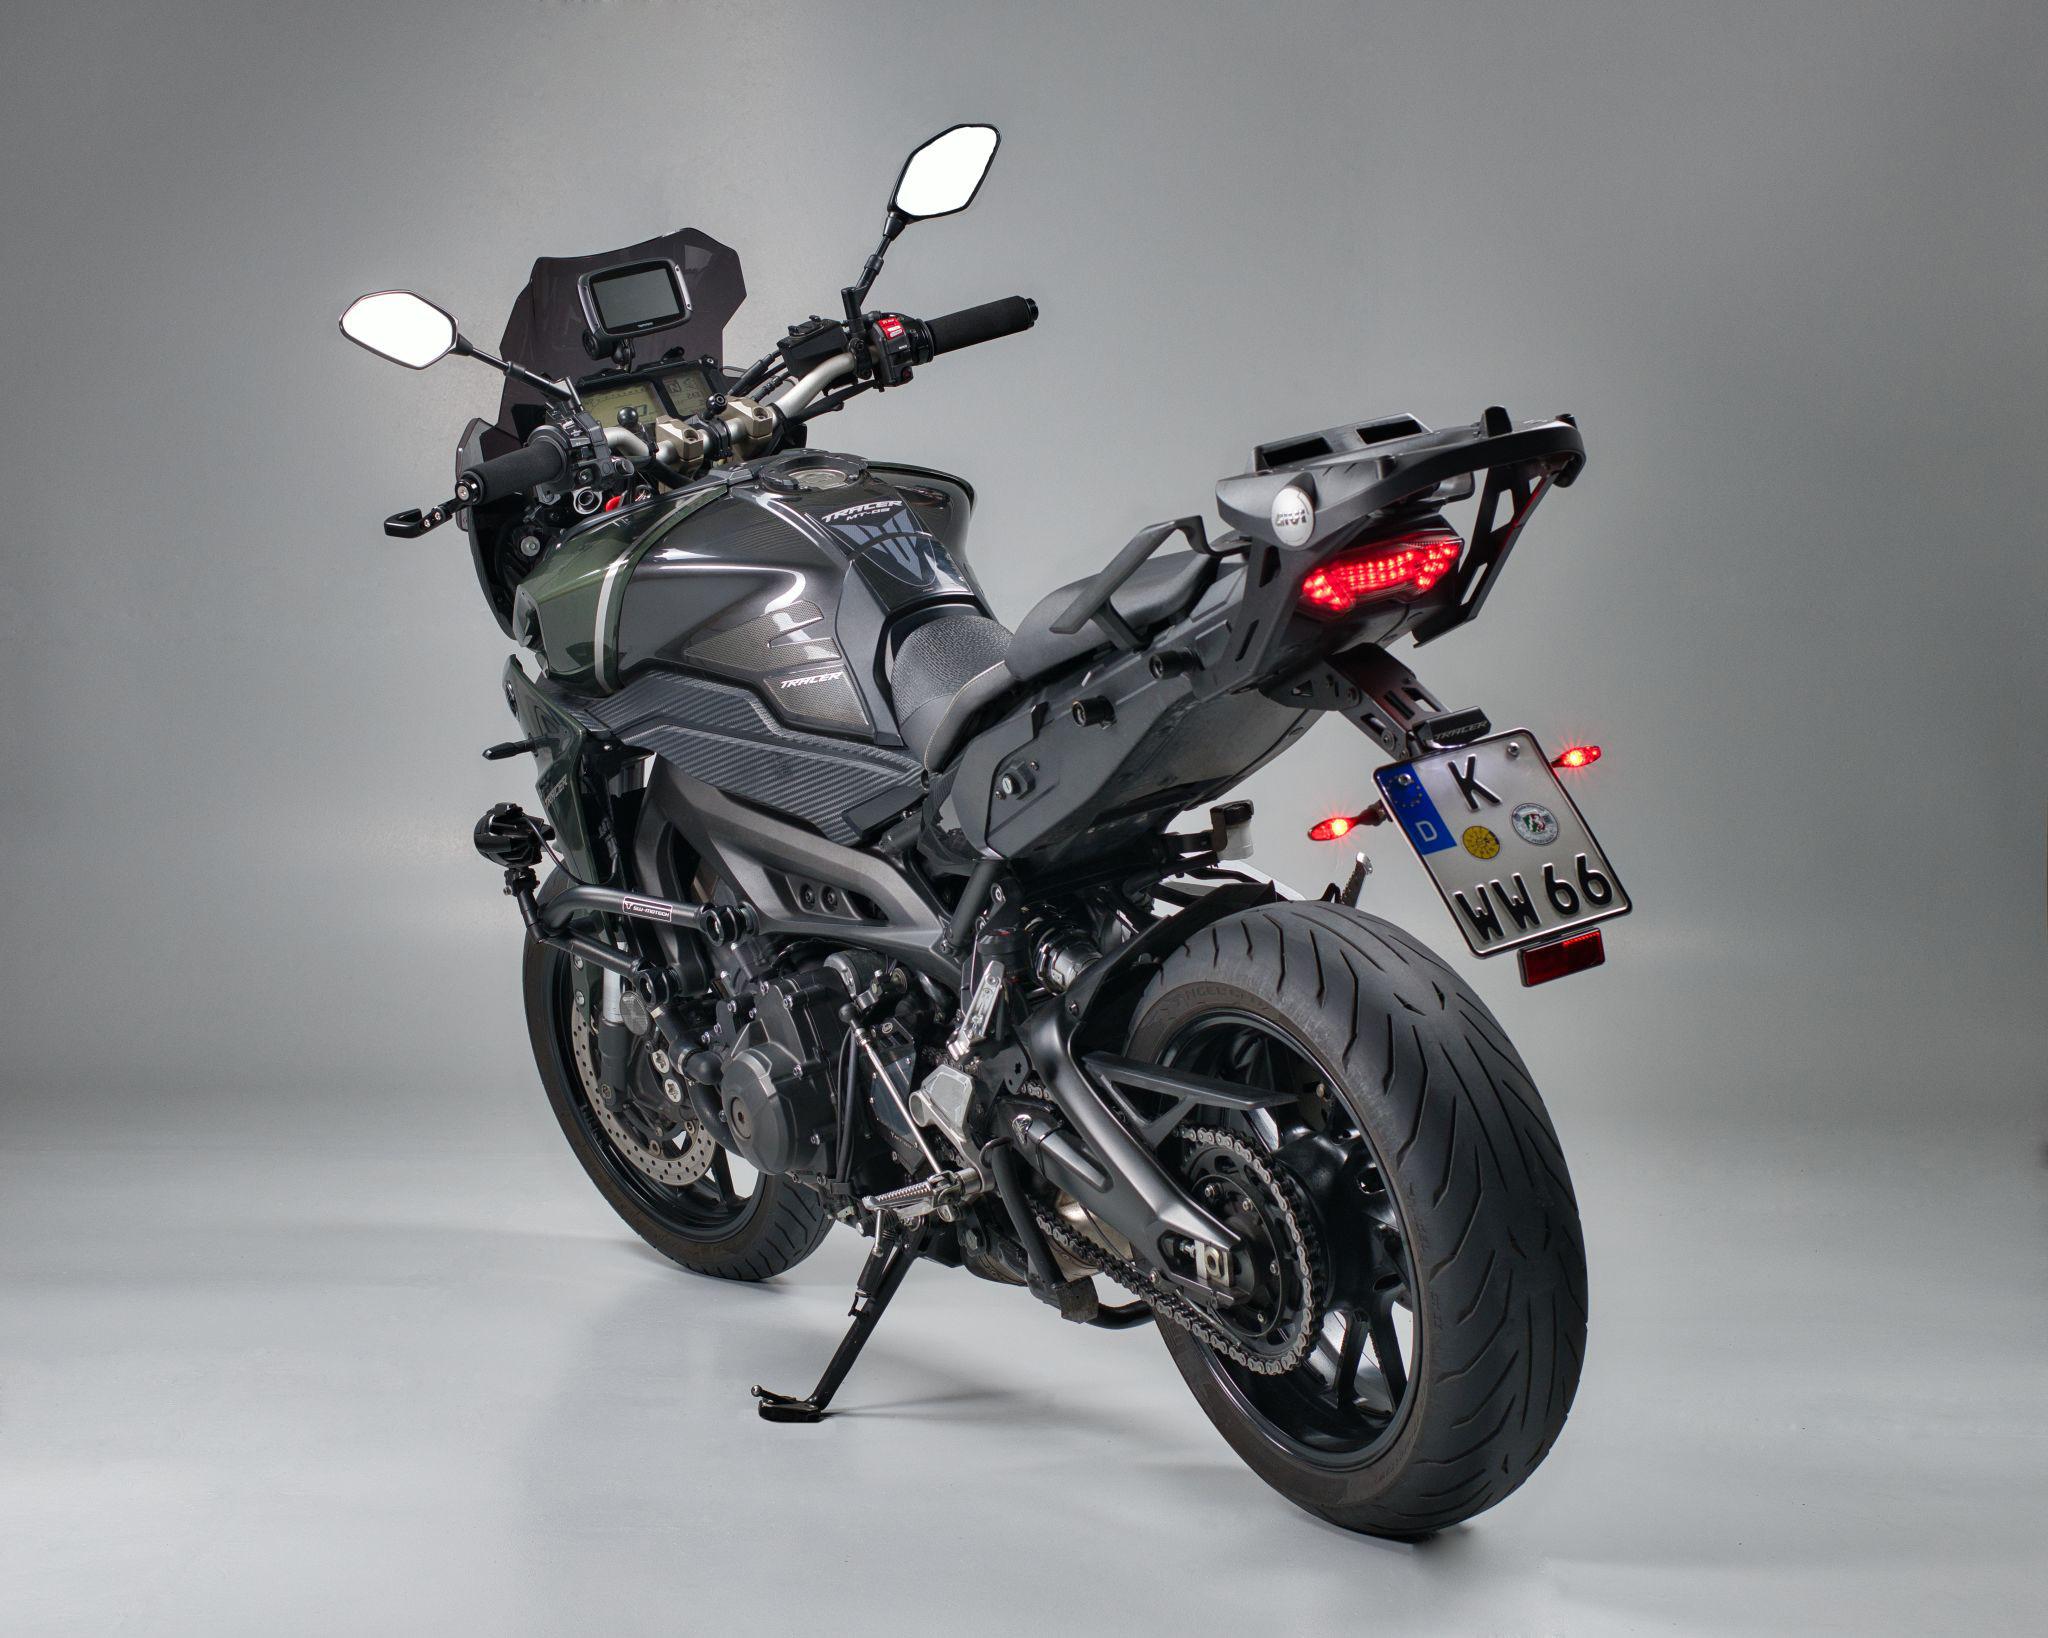 Studiofoto einer Yamaha MT-09 Tracer (schräg links hinten)